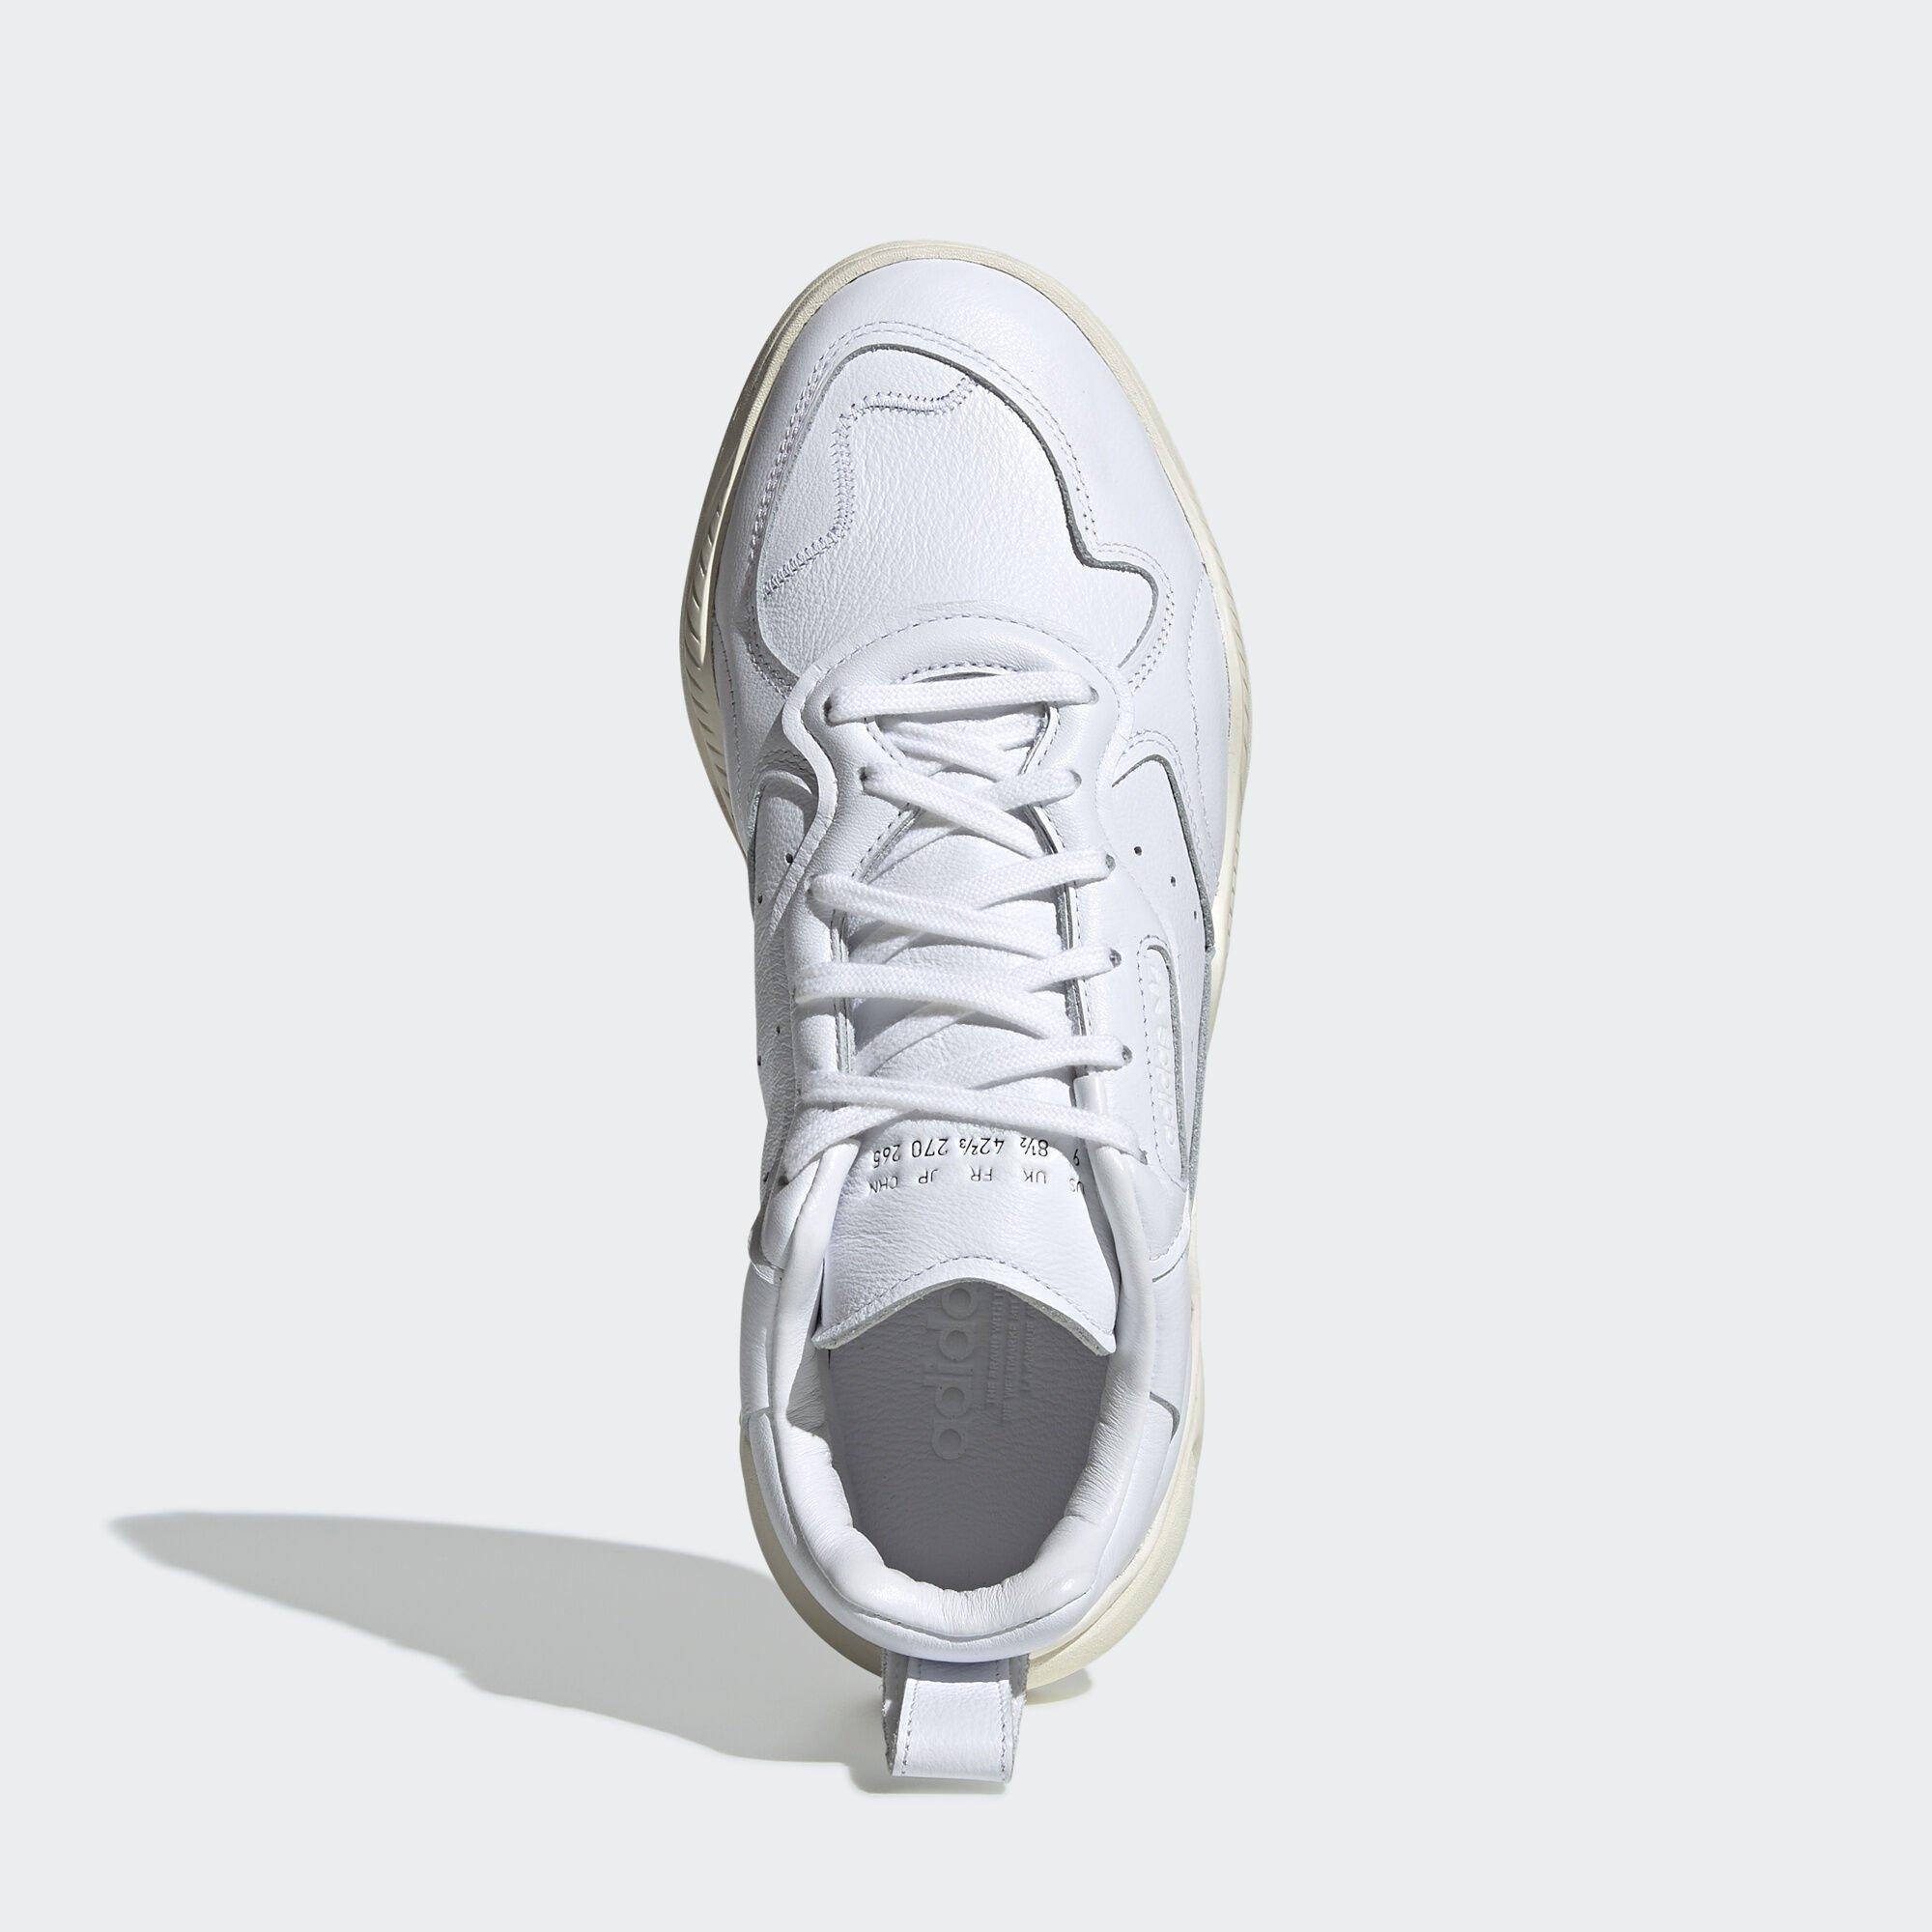 Adidas Court EF1894